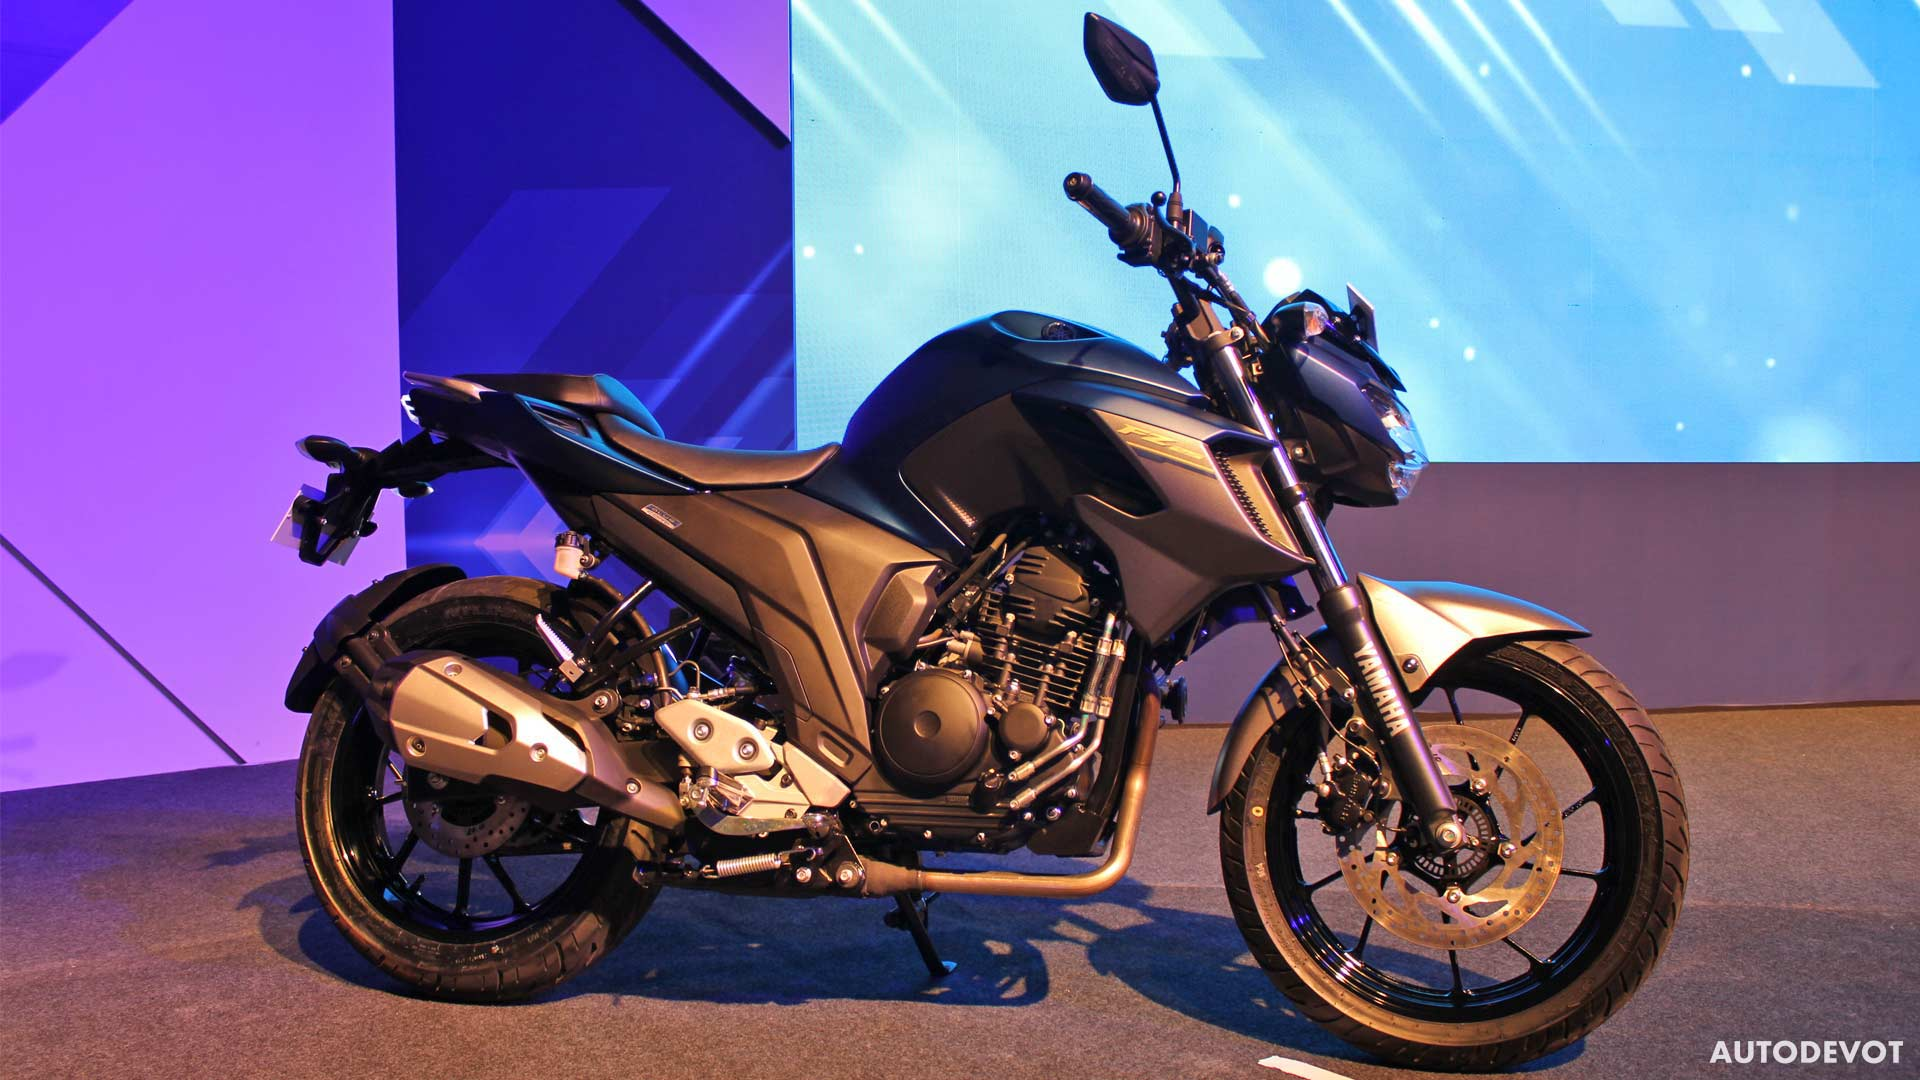 Yamaha-FZ25-ABS-launch-2019-Bengaluru